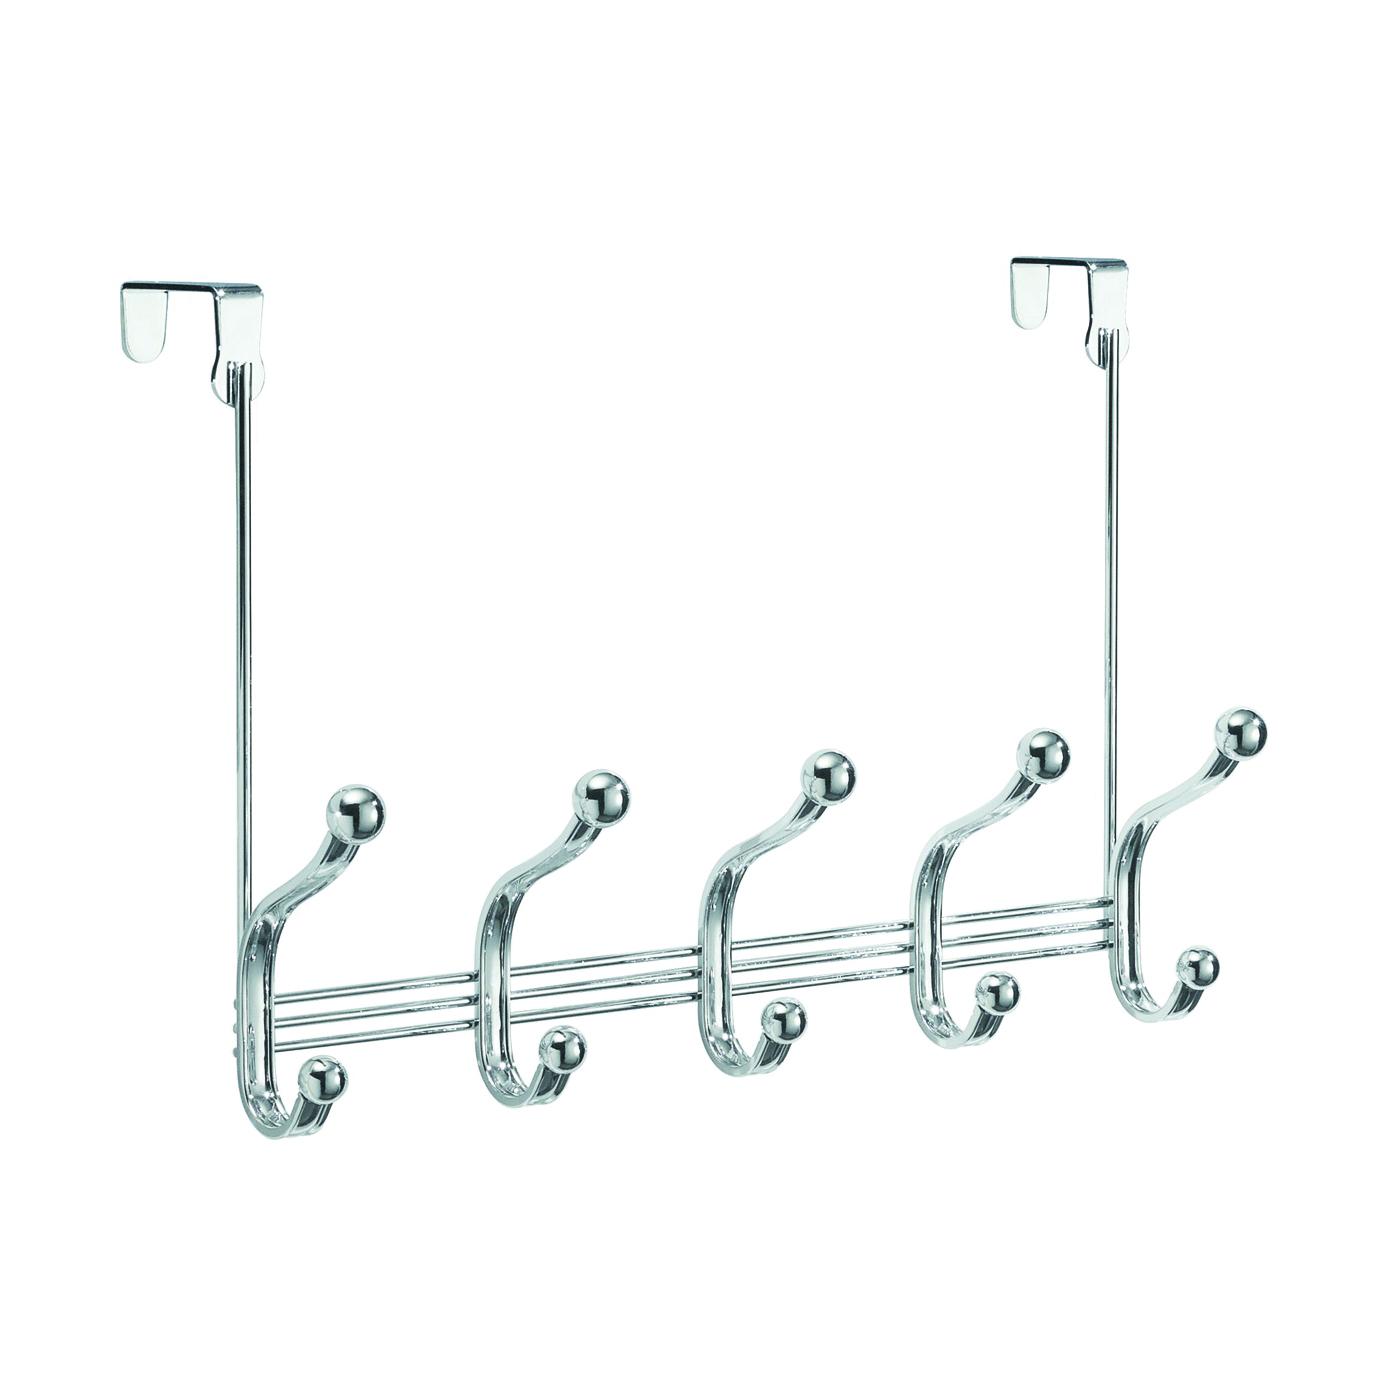 Picture of iDESIGN 53470 Hanger Rack